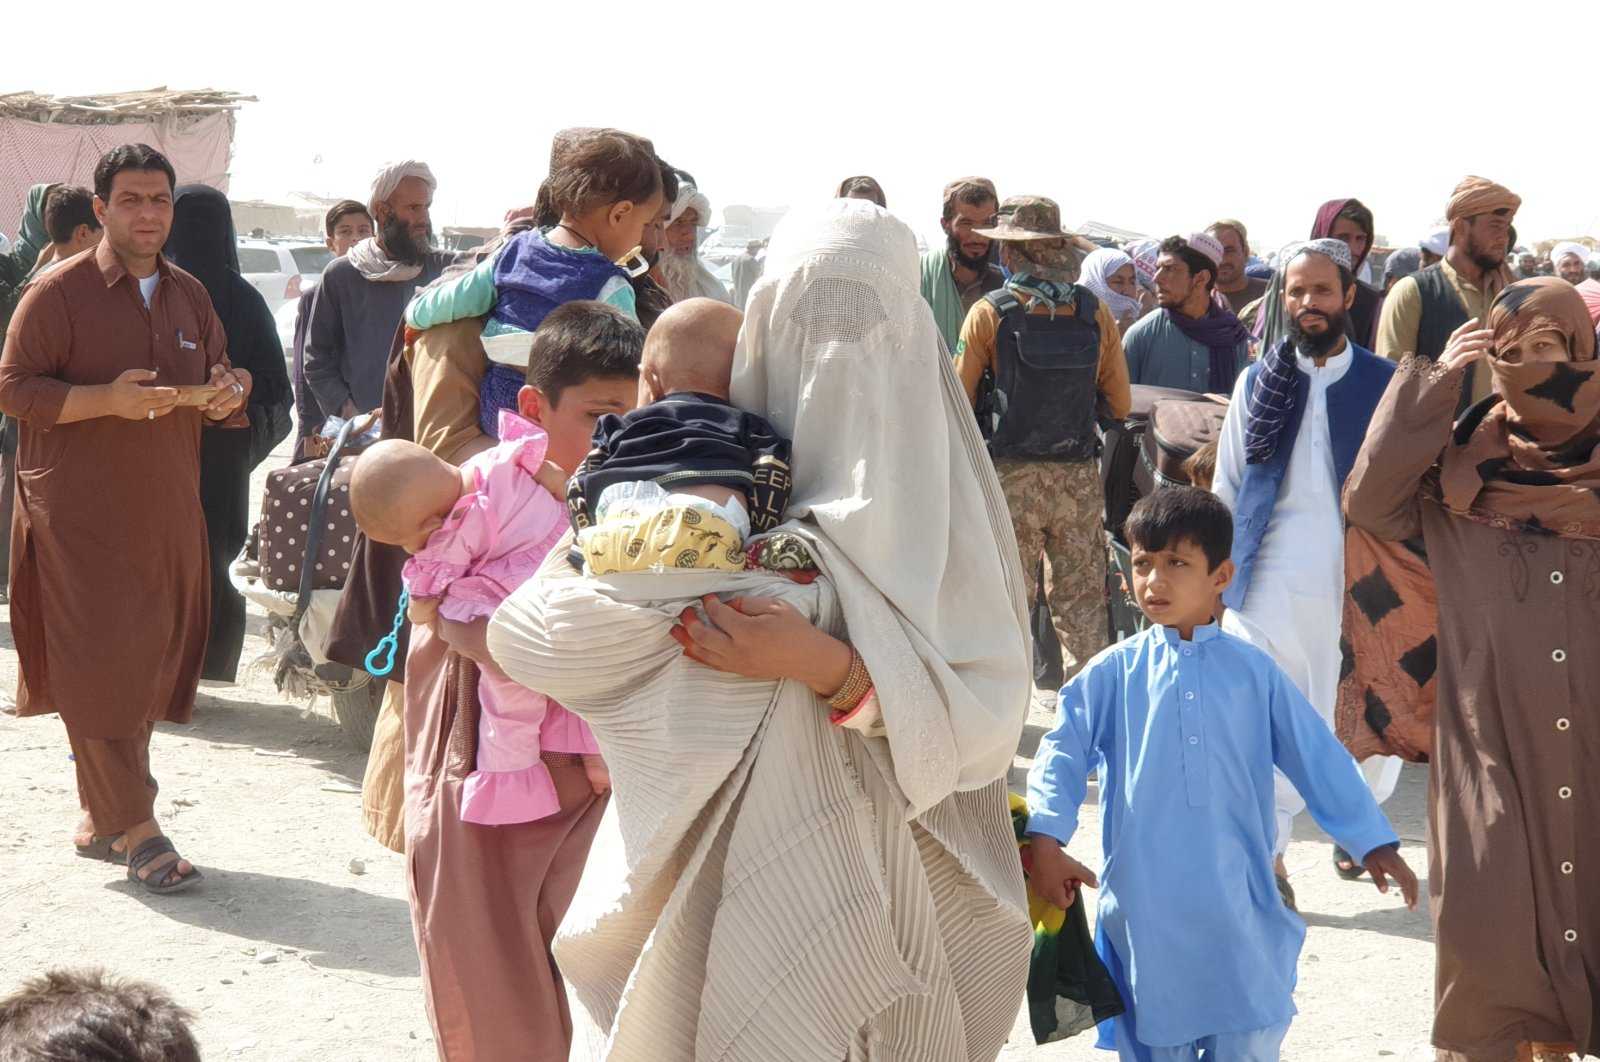 People cross into Afghanistan at Chaman border point, Pakistan, Aug. 27, 2021. (EPA Photo)